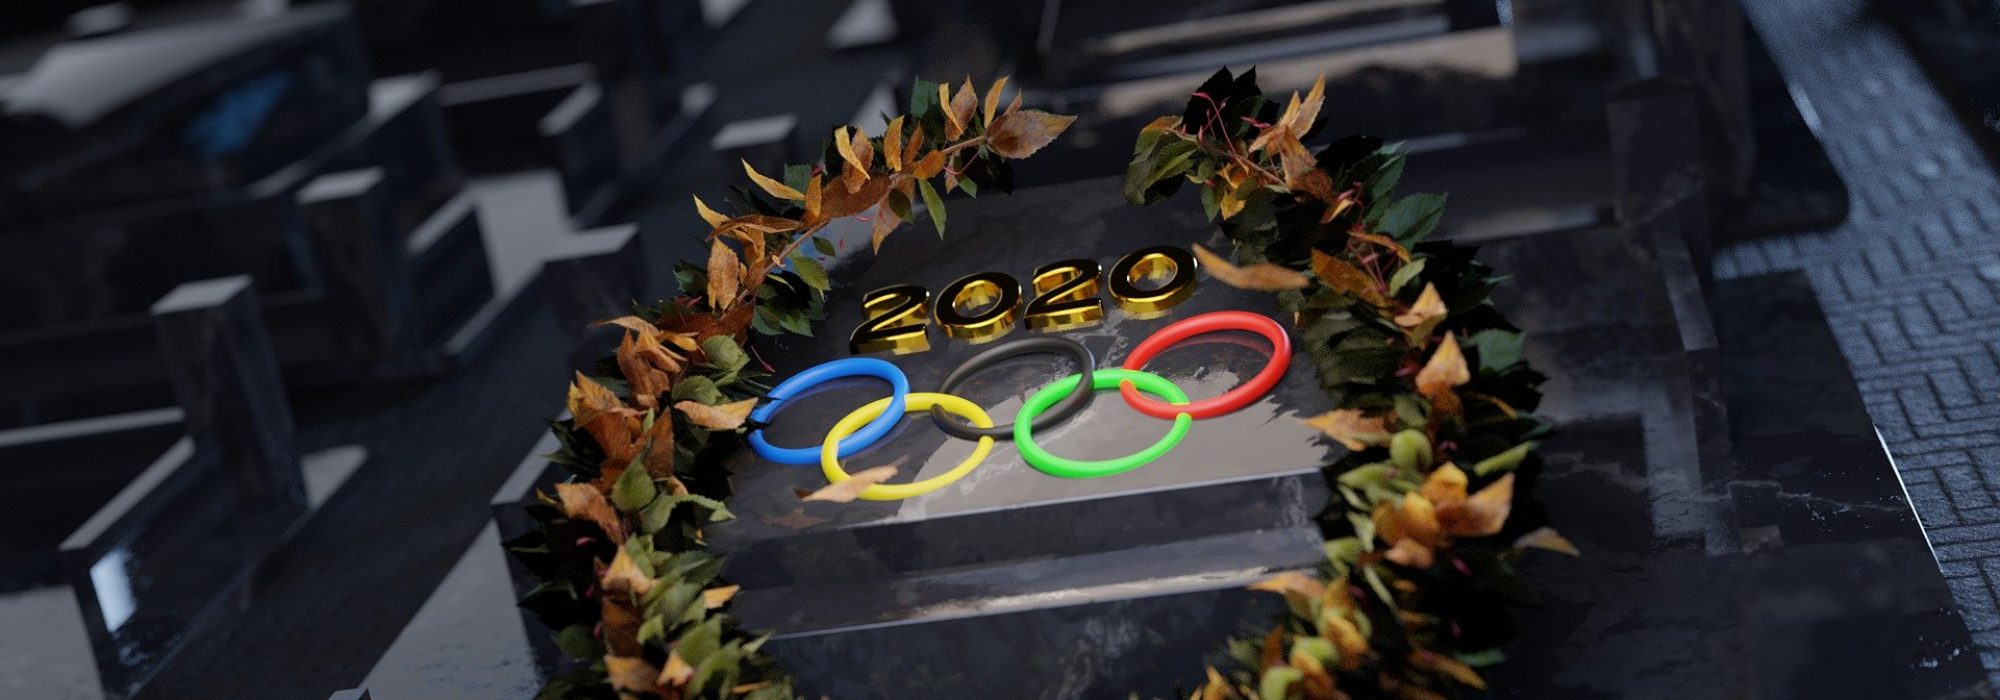 olympics-4973067_1920